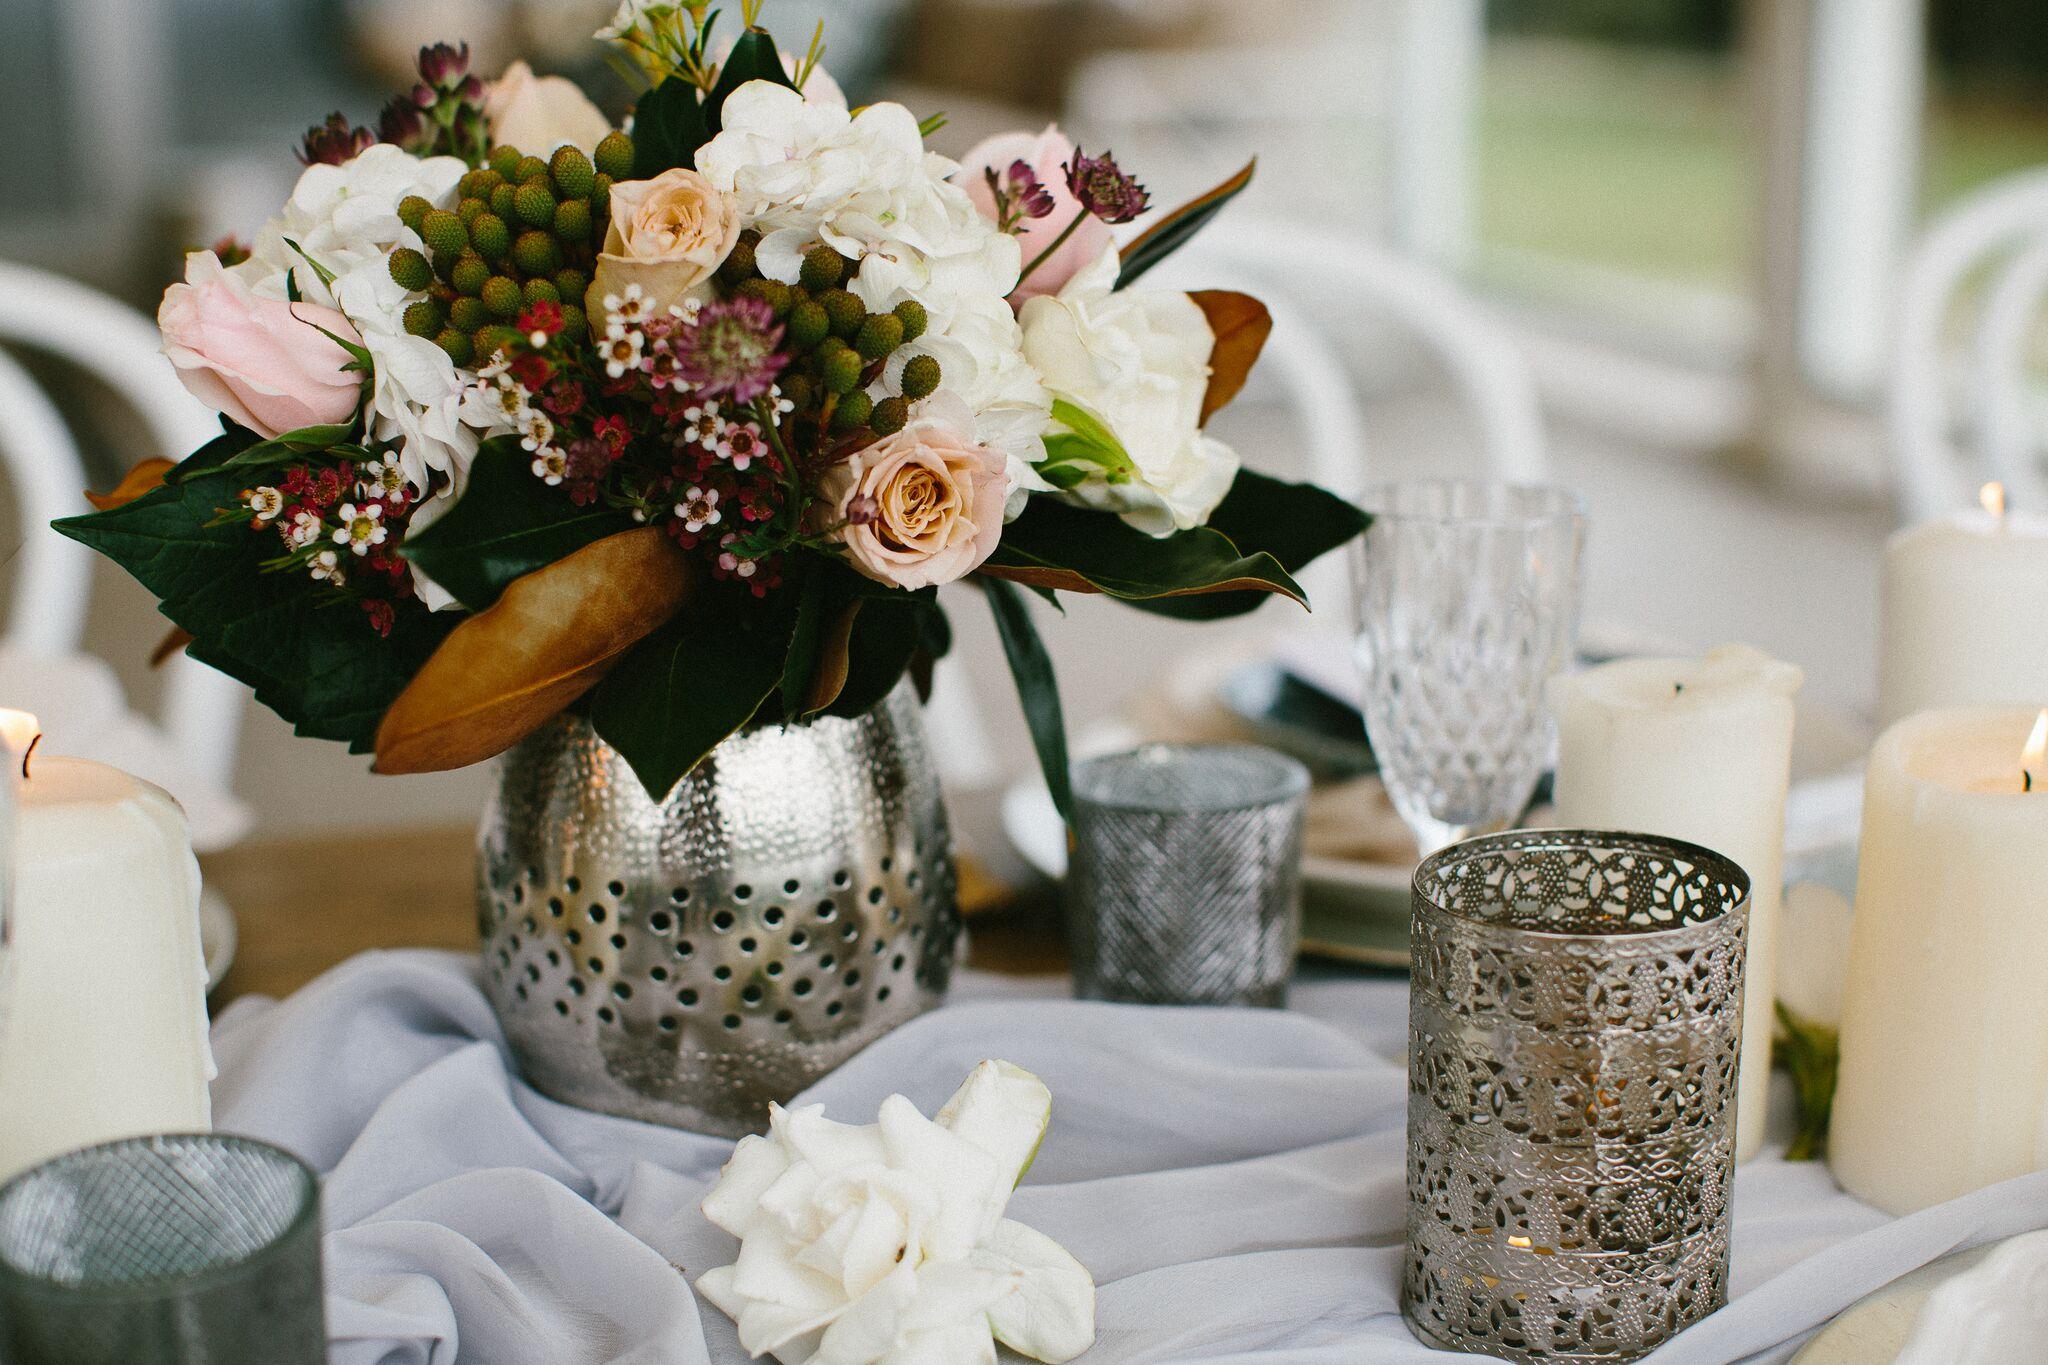 Wedding Decoration Hire Checklist - Image via Ryder Evans Photography